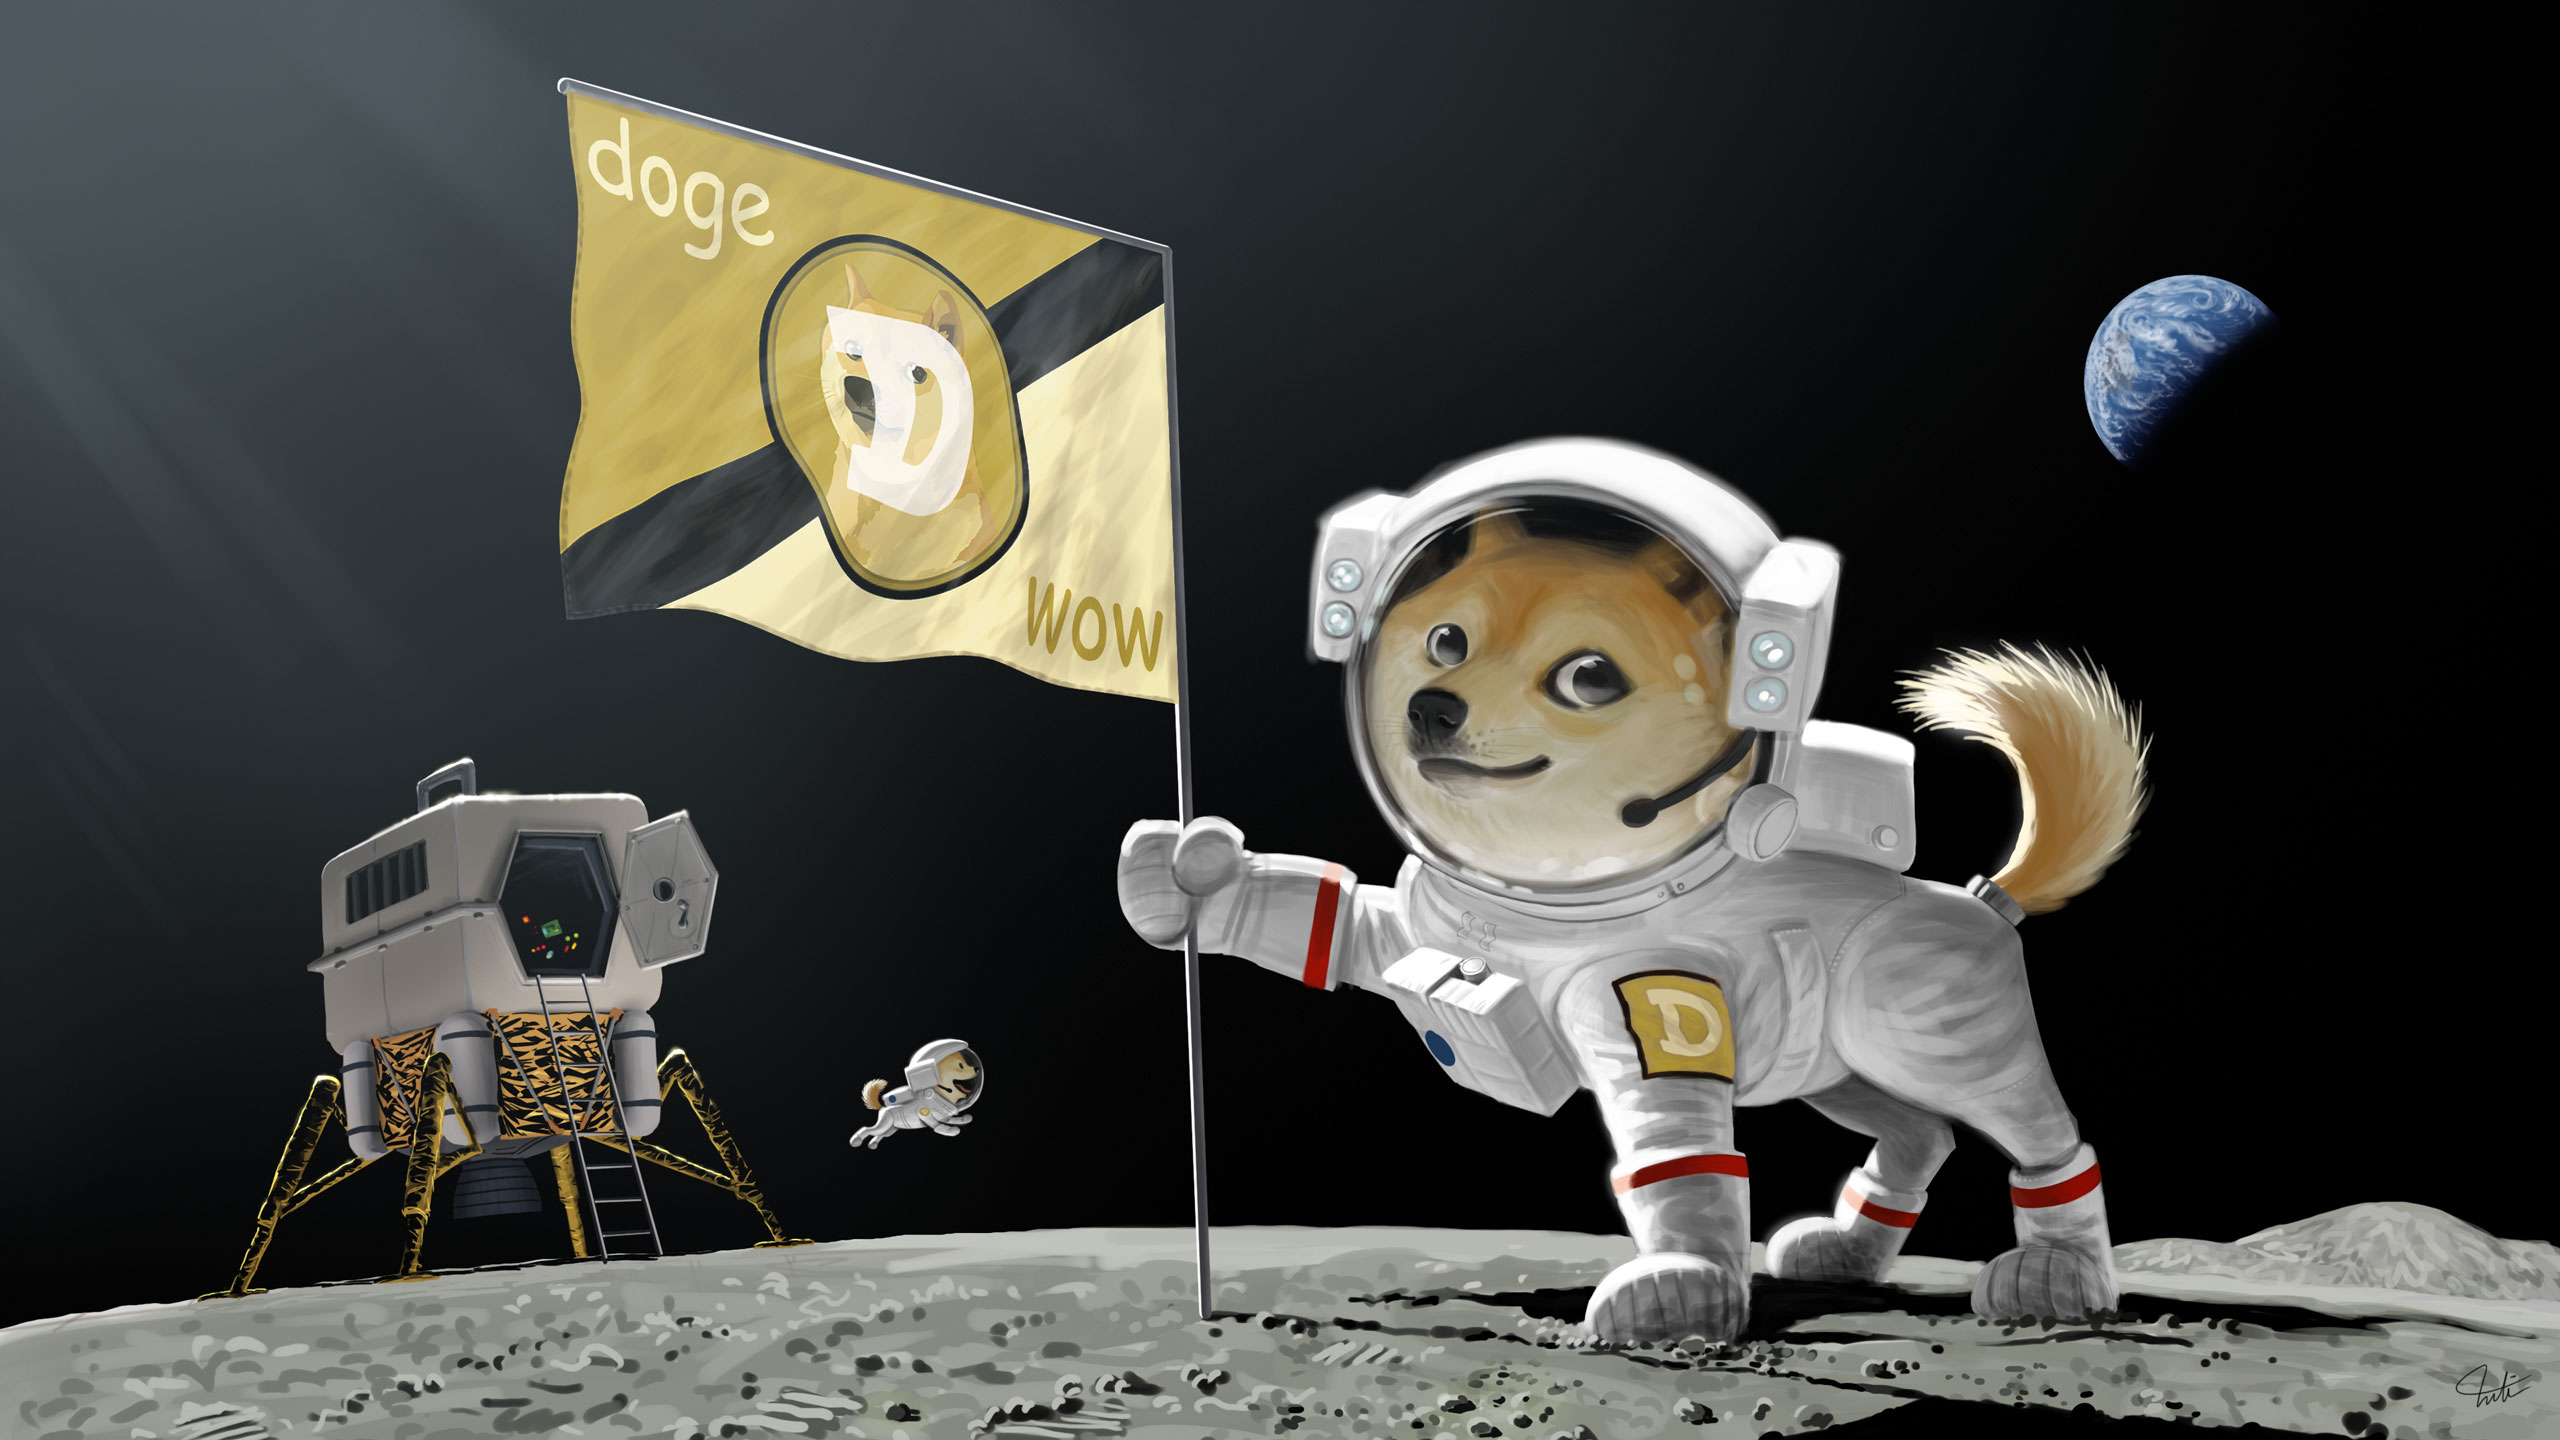 Doge Dog Astronaut Meme Moon Landing Earth Planet Flag wallpaper 2560x1440